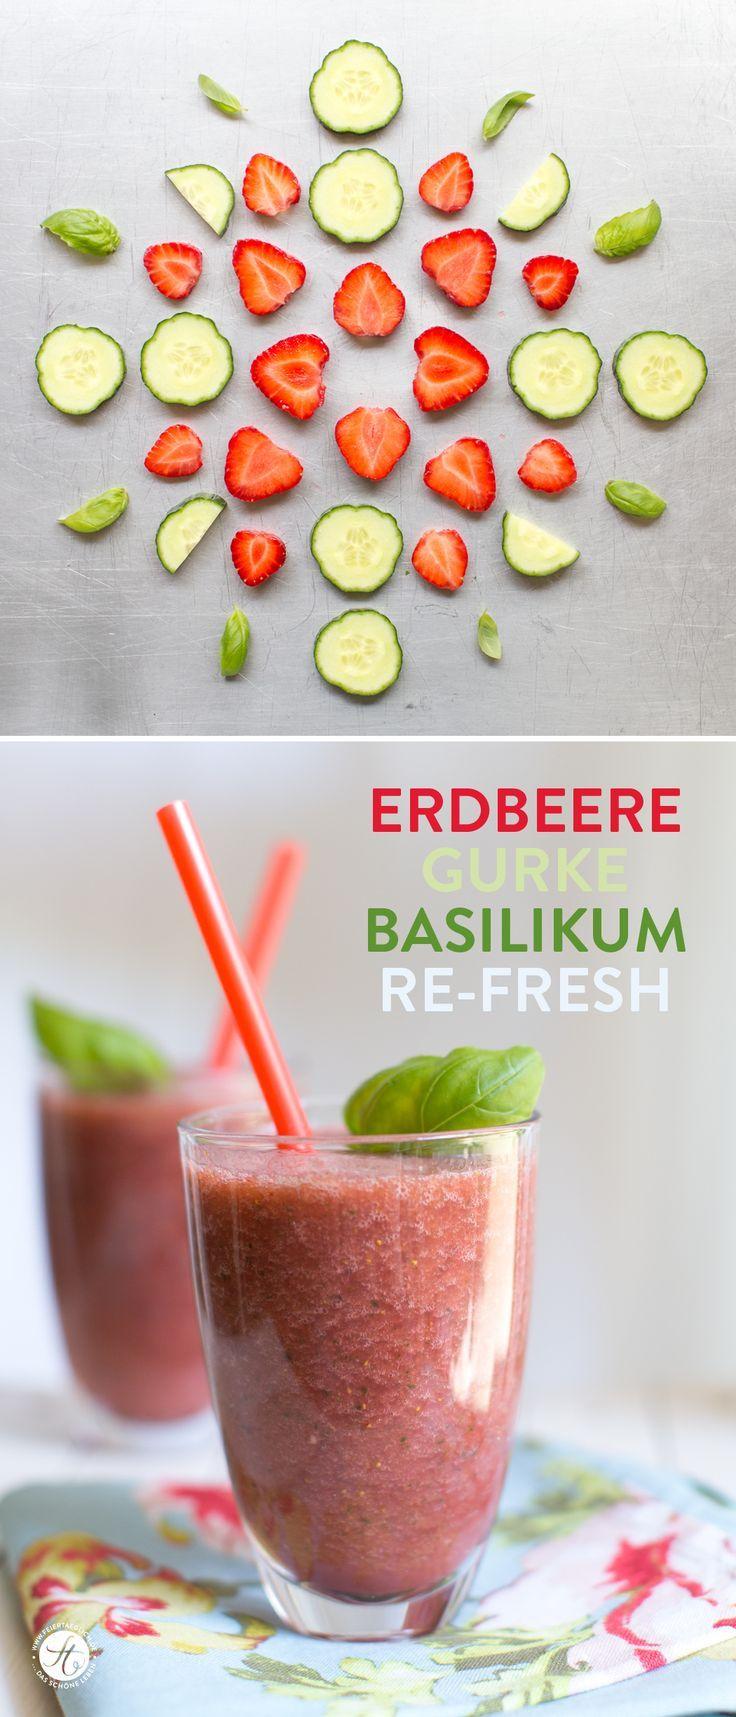 ErdbeereGurkeBasilikum Smoothie Refresh zum